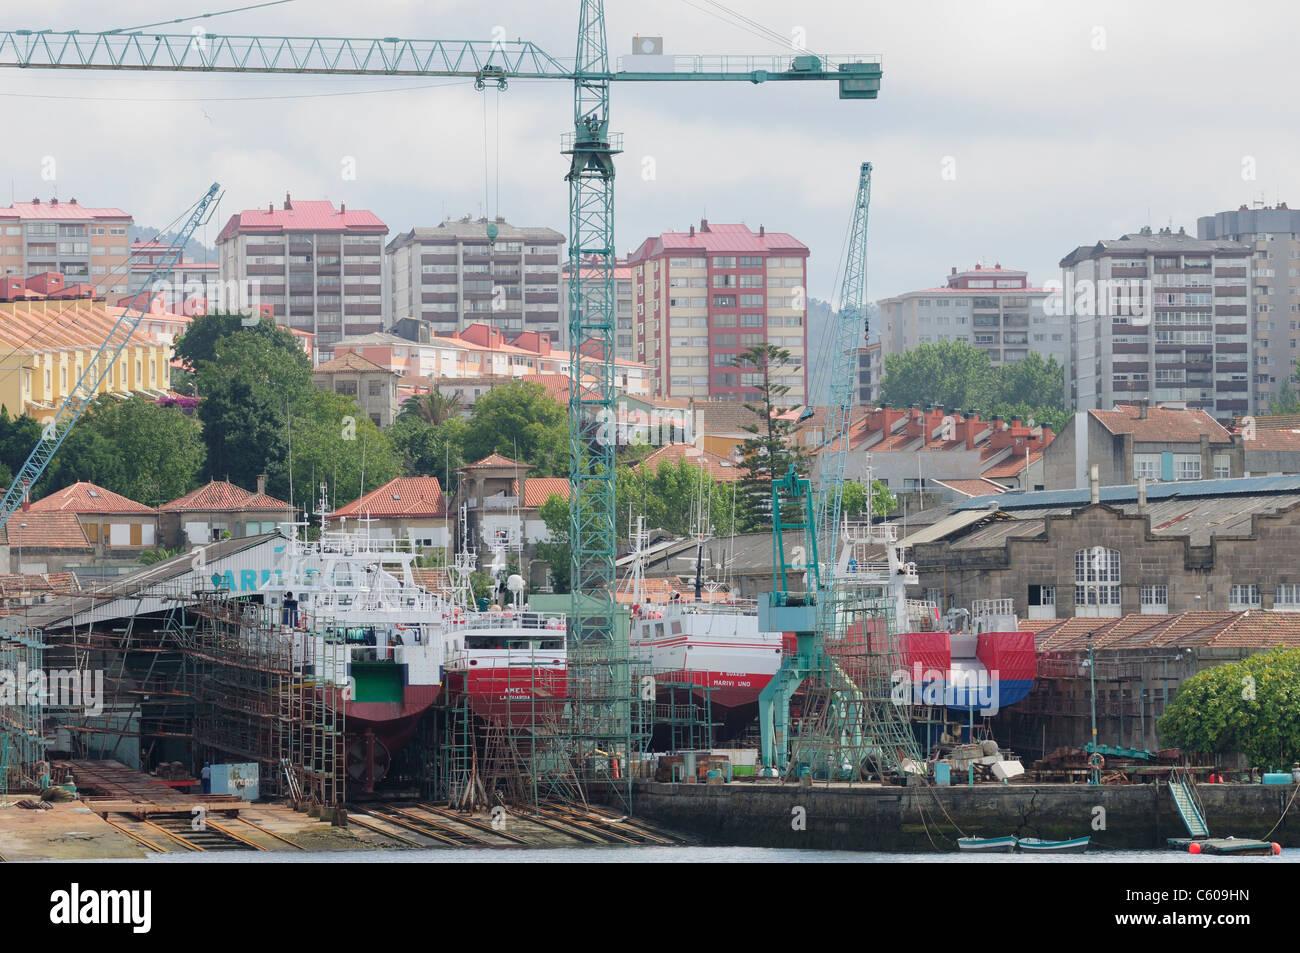 Shipyards. Vigo, Spain - Stock Image